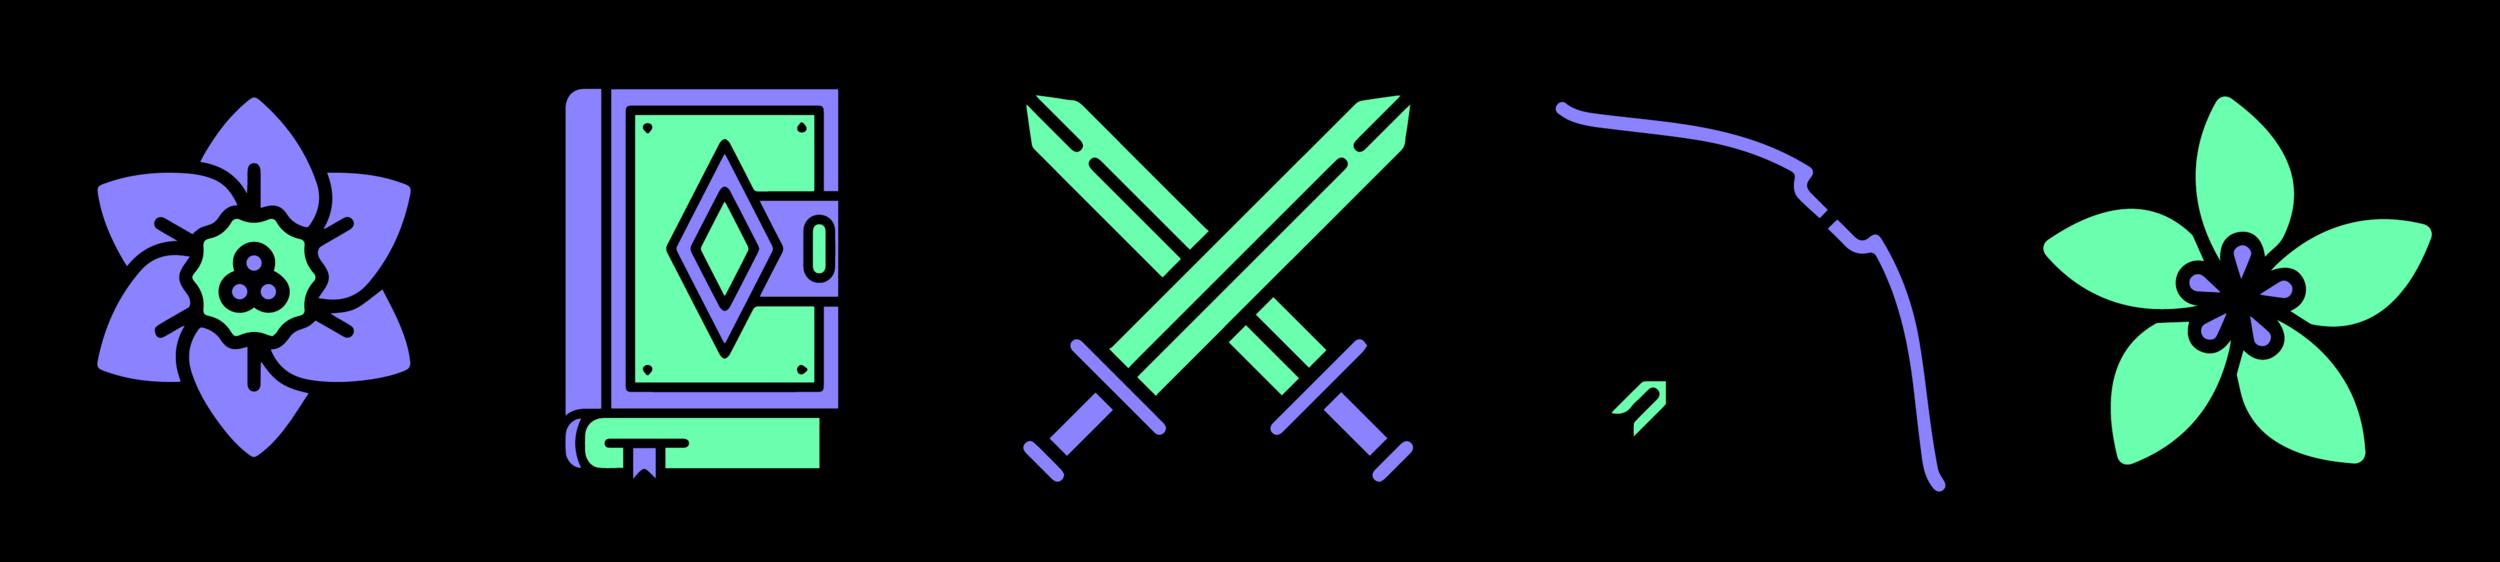 Emerald Dream Swords Spells Archery